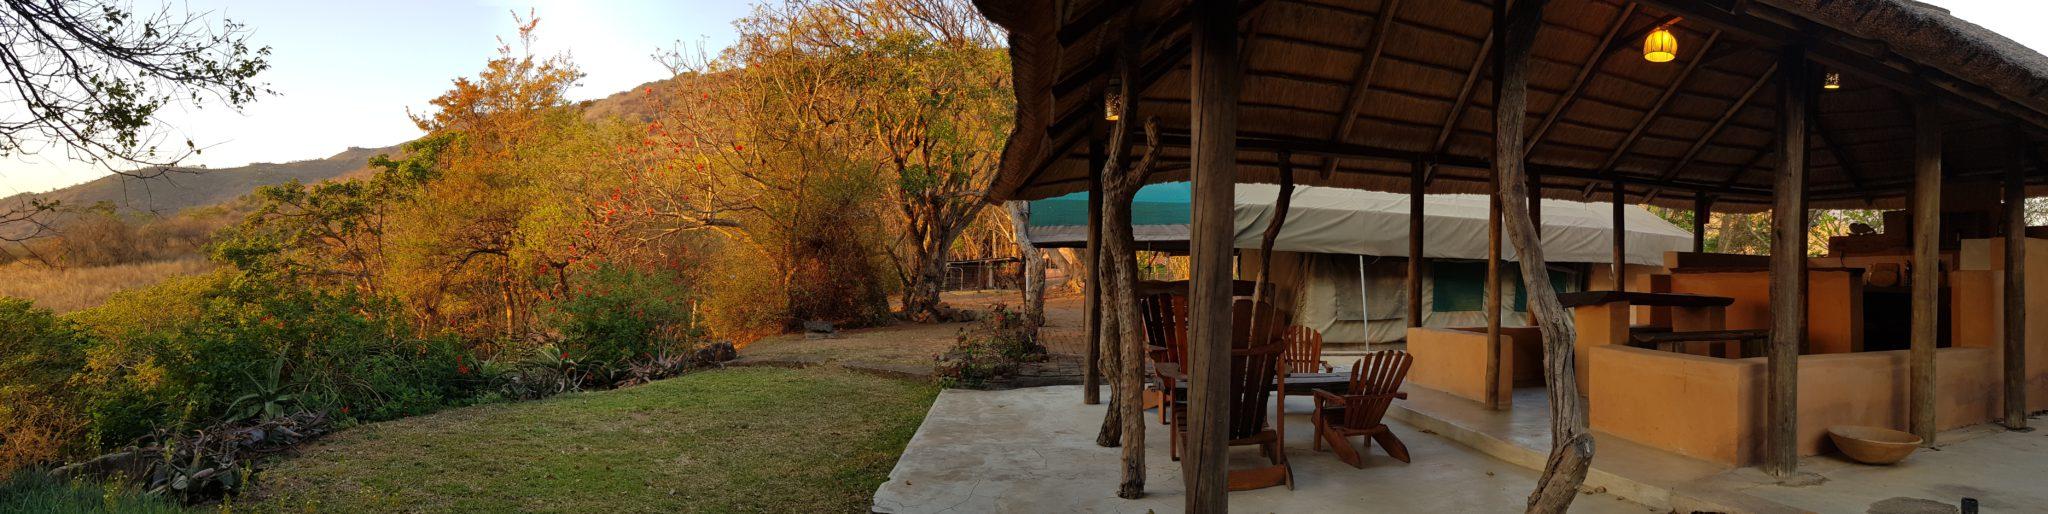 Weavers Nest Family Camp: Swaziland glamping accommodation